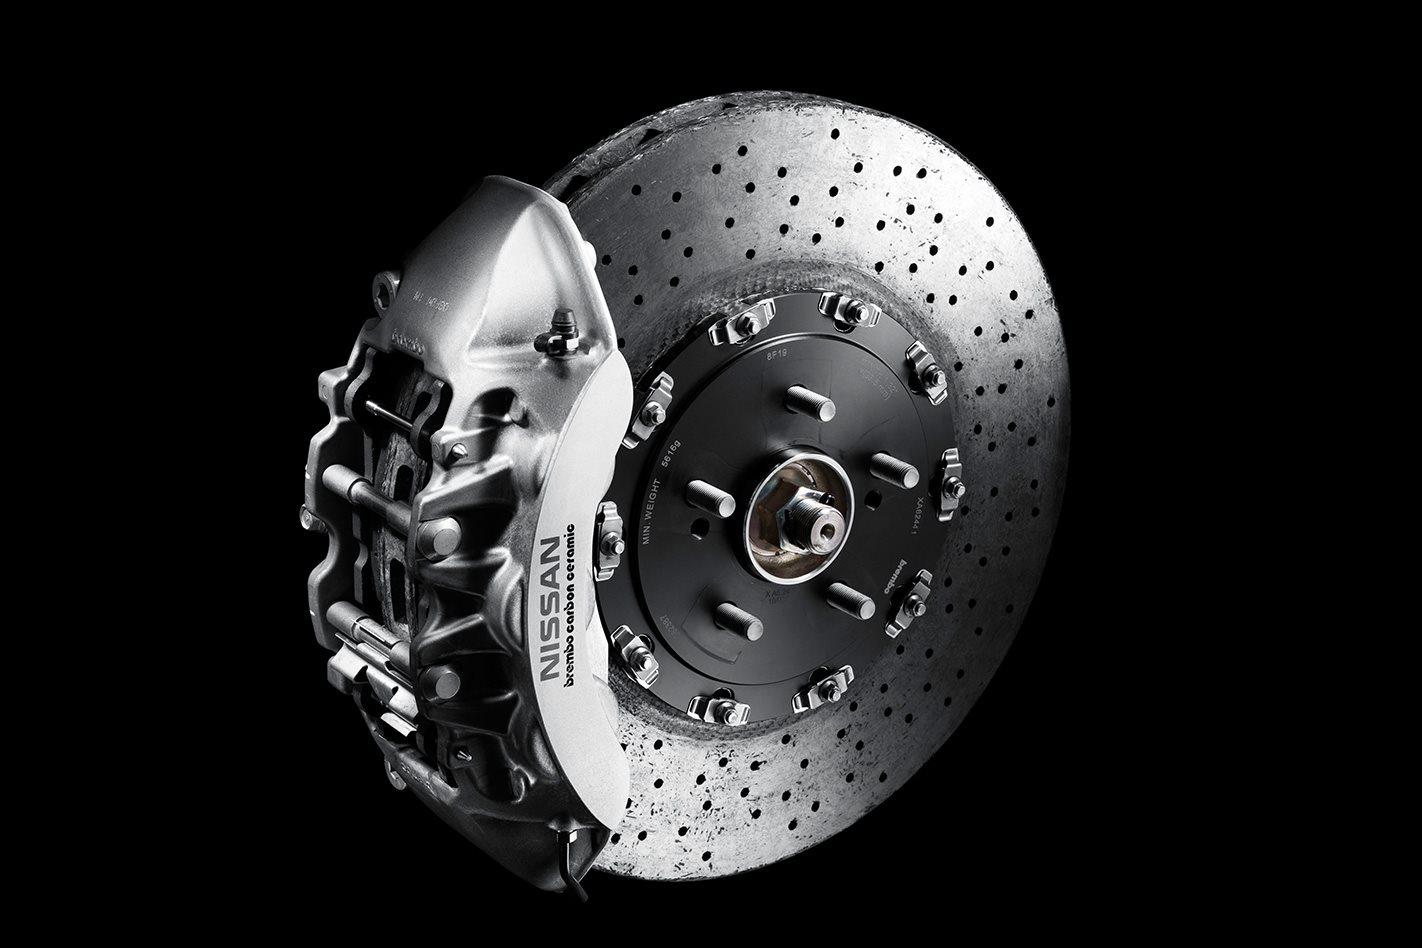 Nissan-GT-R-Spec-V-clutch.jpg